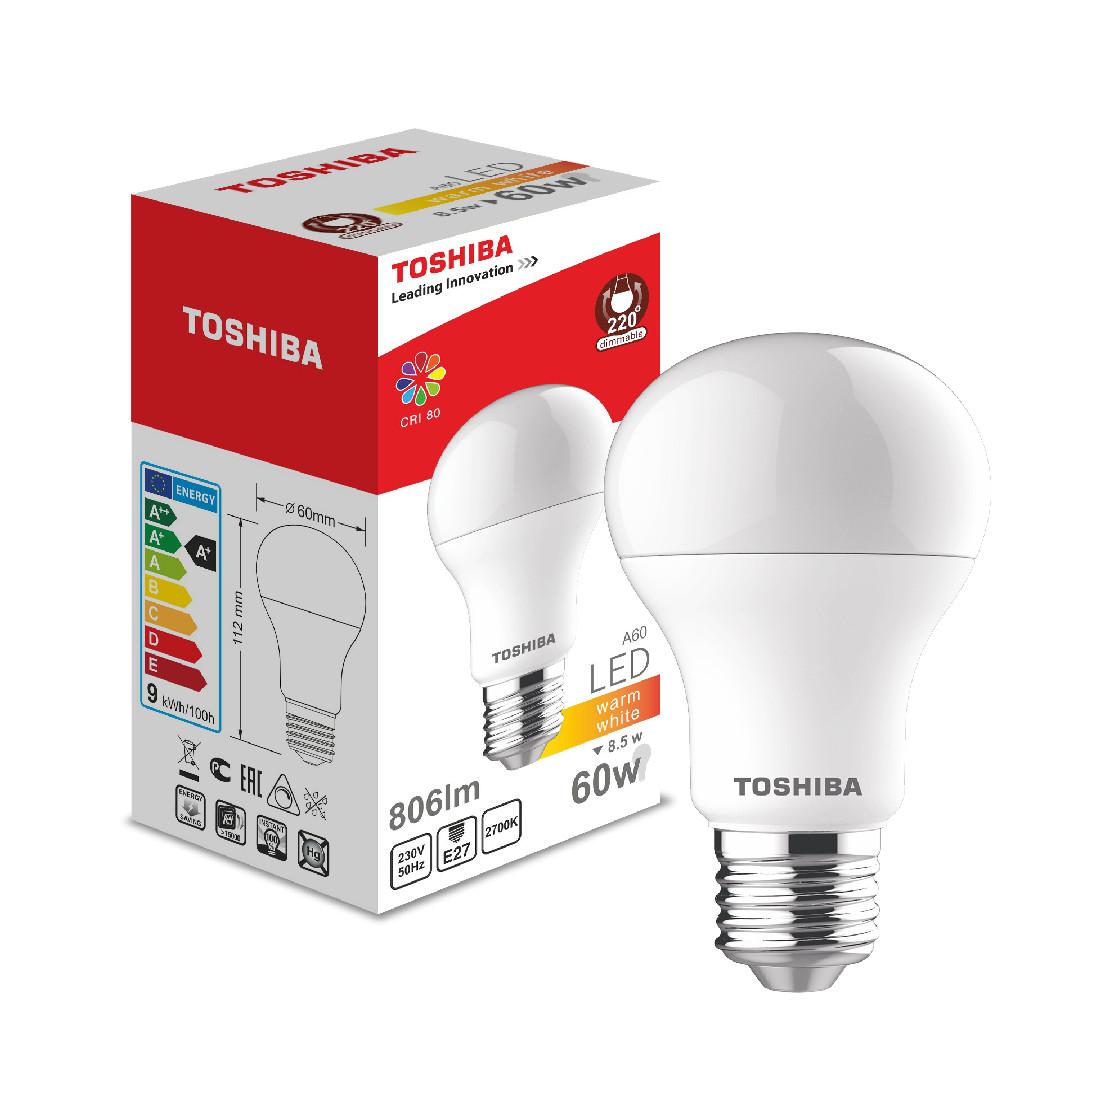 Светодиодная лампа Toshiba А60 8,5W (60W) 2700K 806lm E27 Dim Тёплый